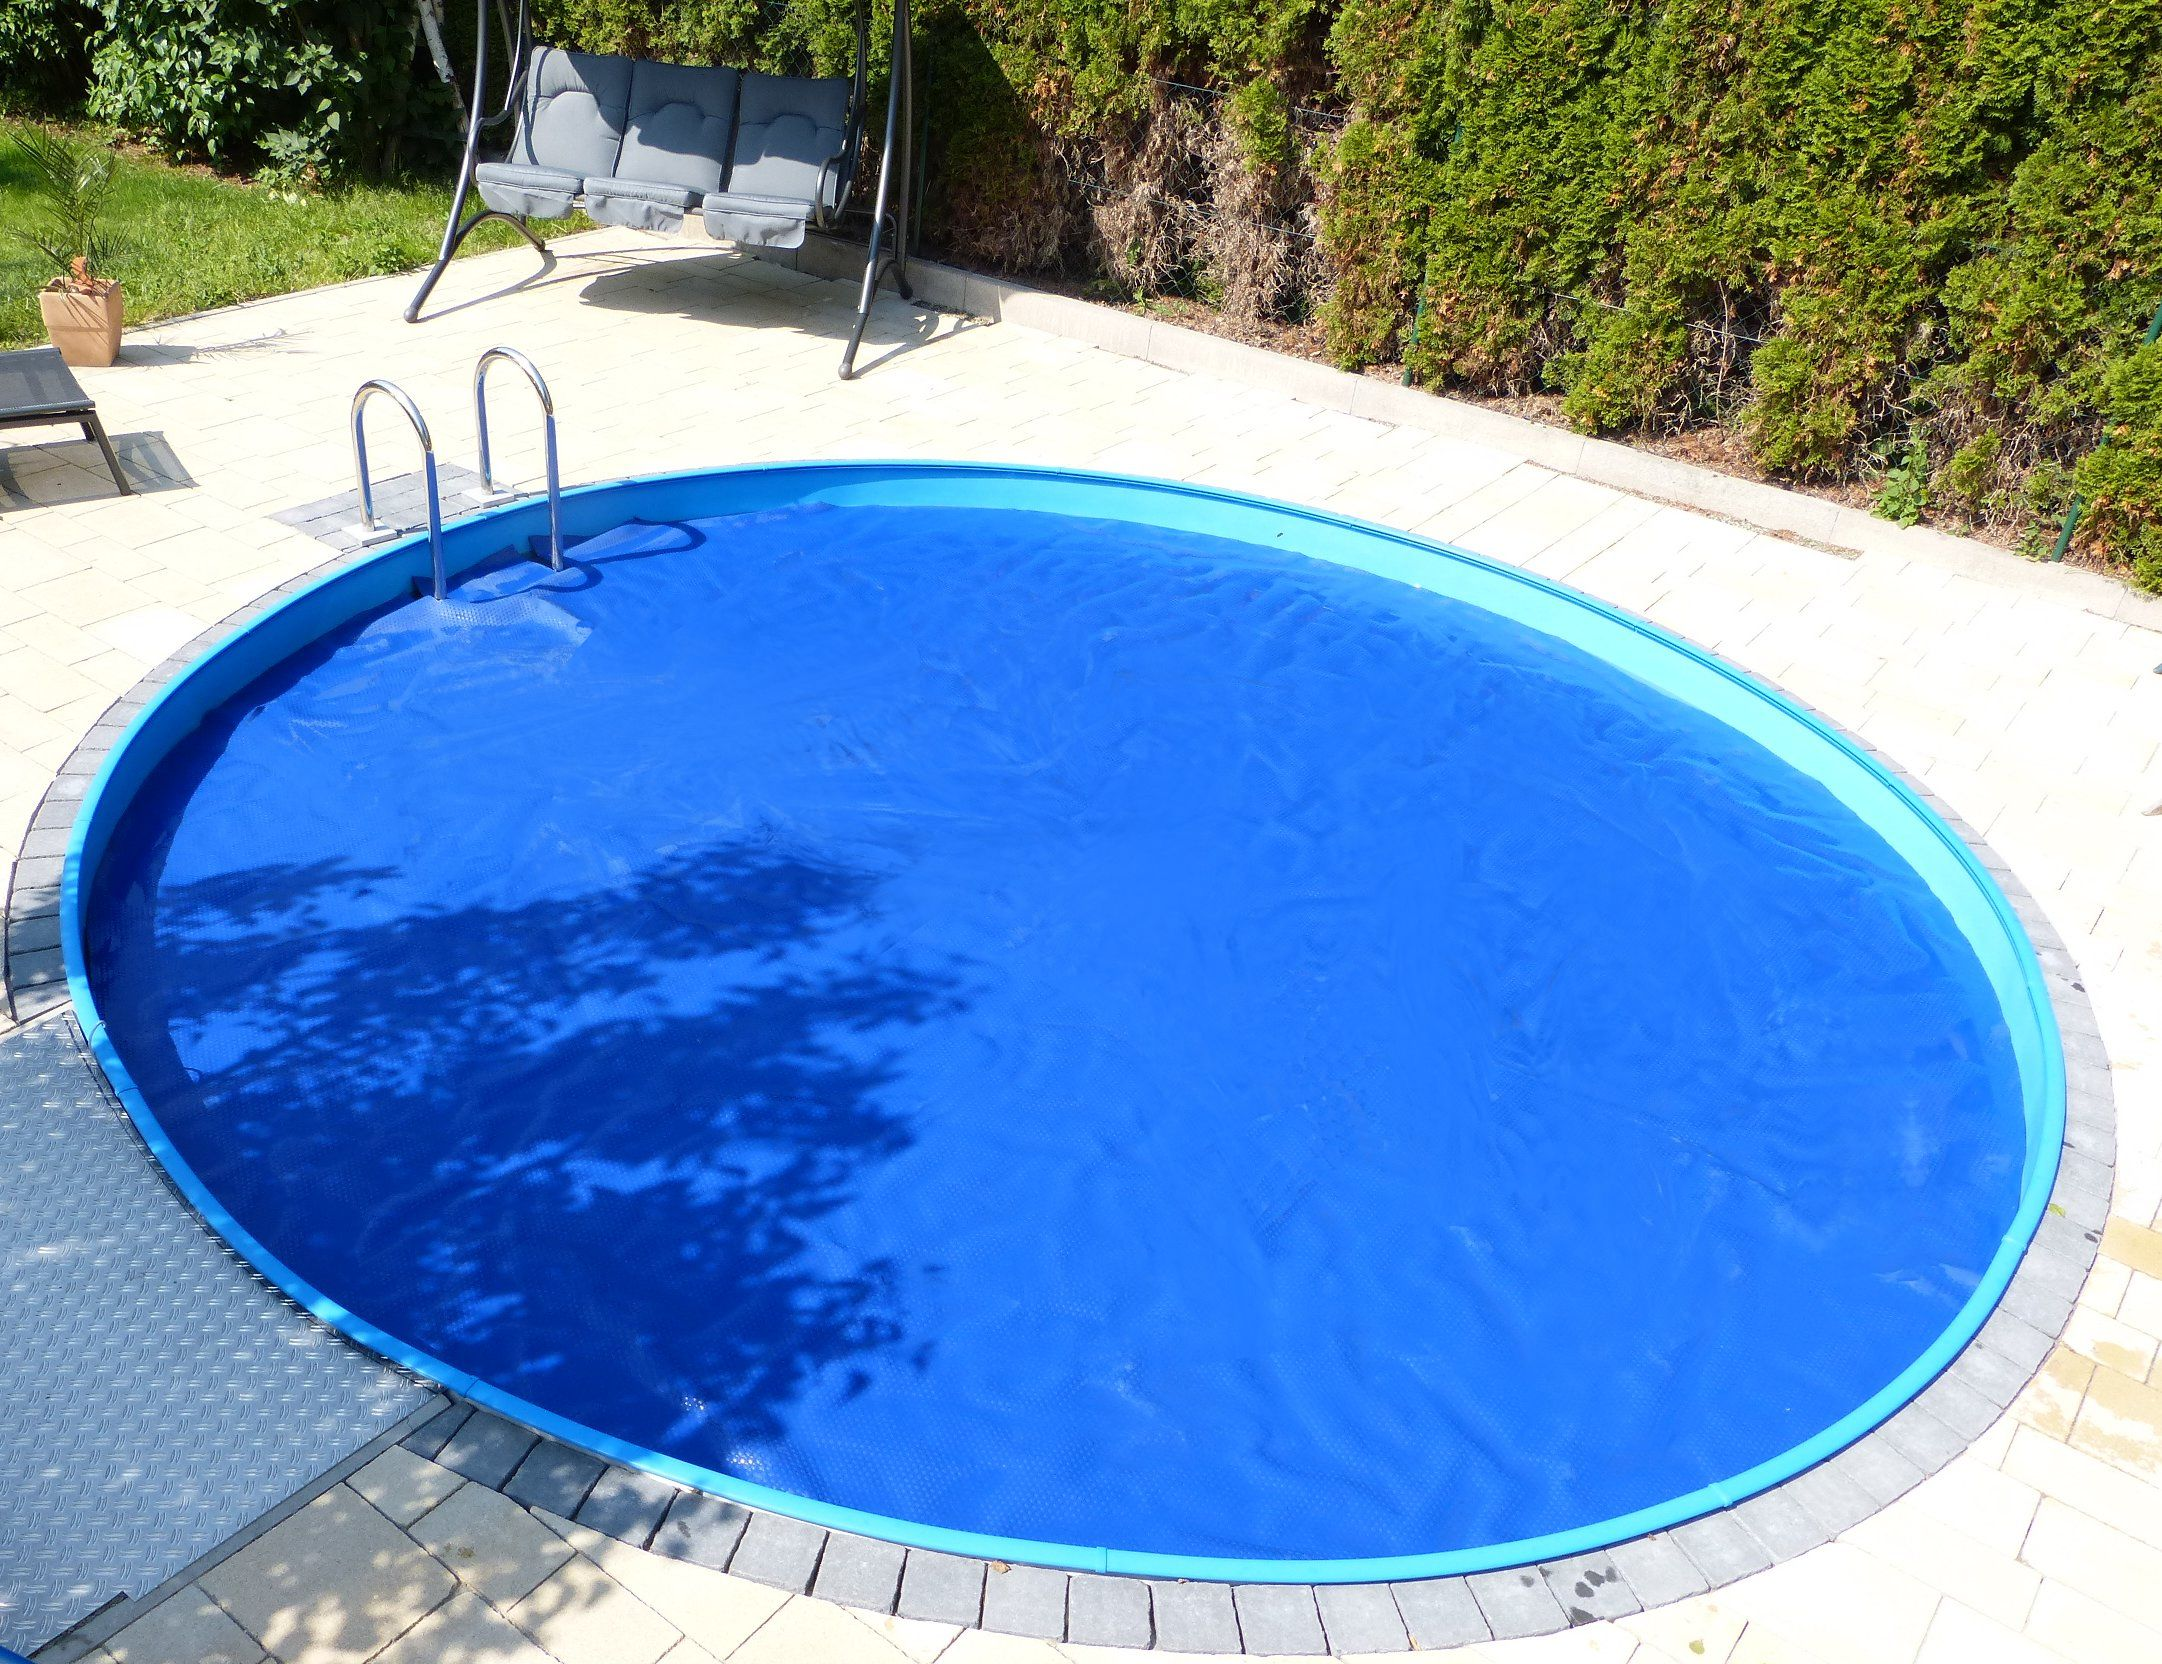 Solarfolie poolfolie solarabdeckung pool m rund for Pool rund 3 60